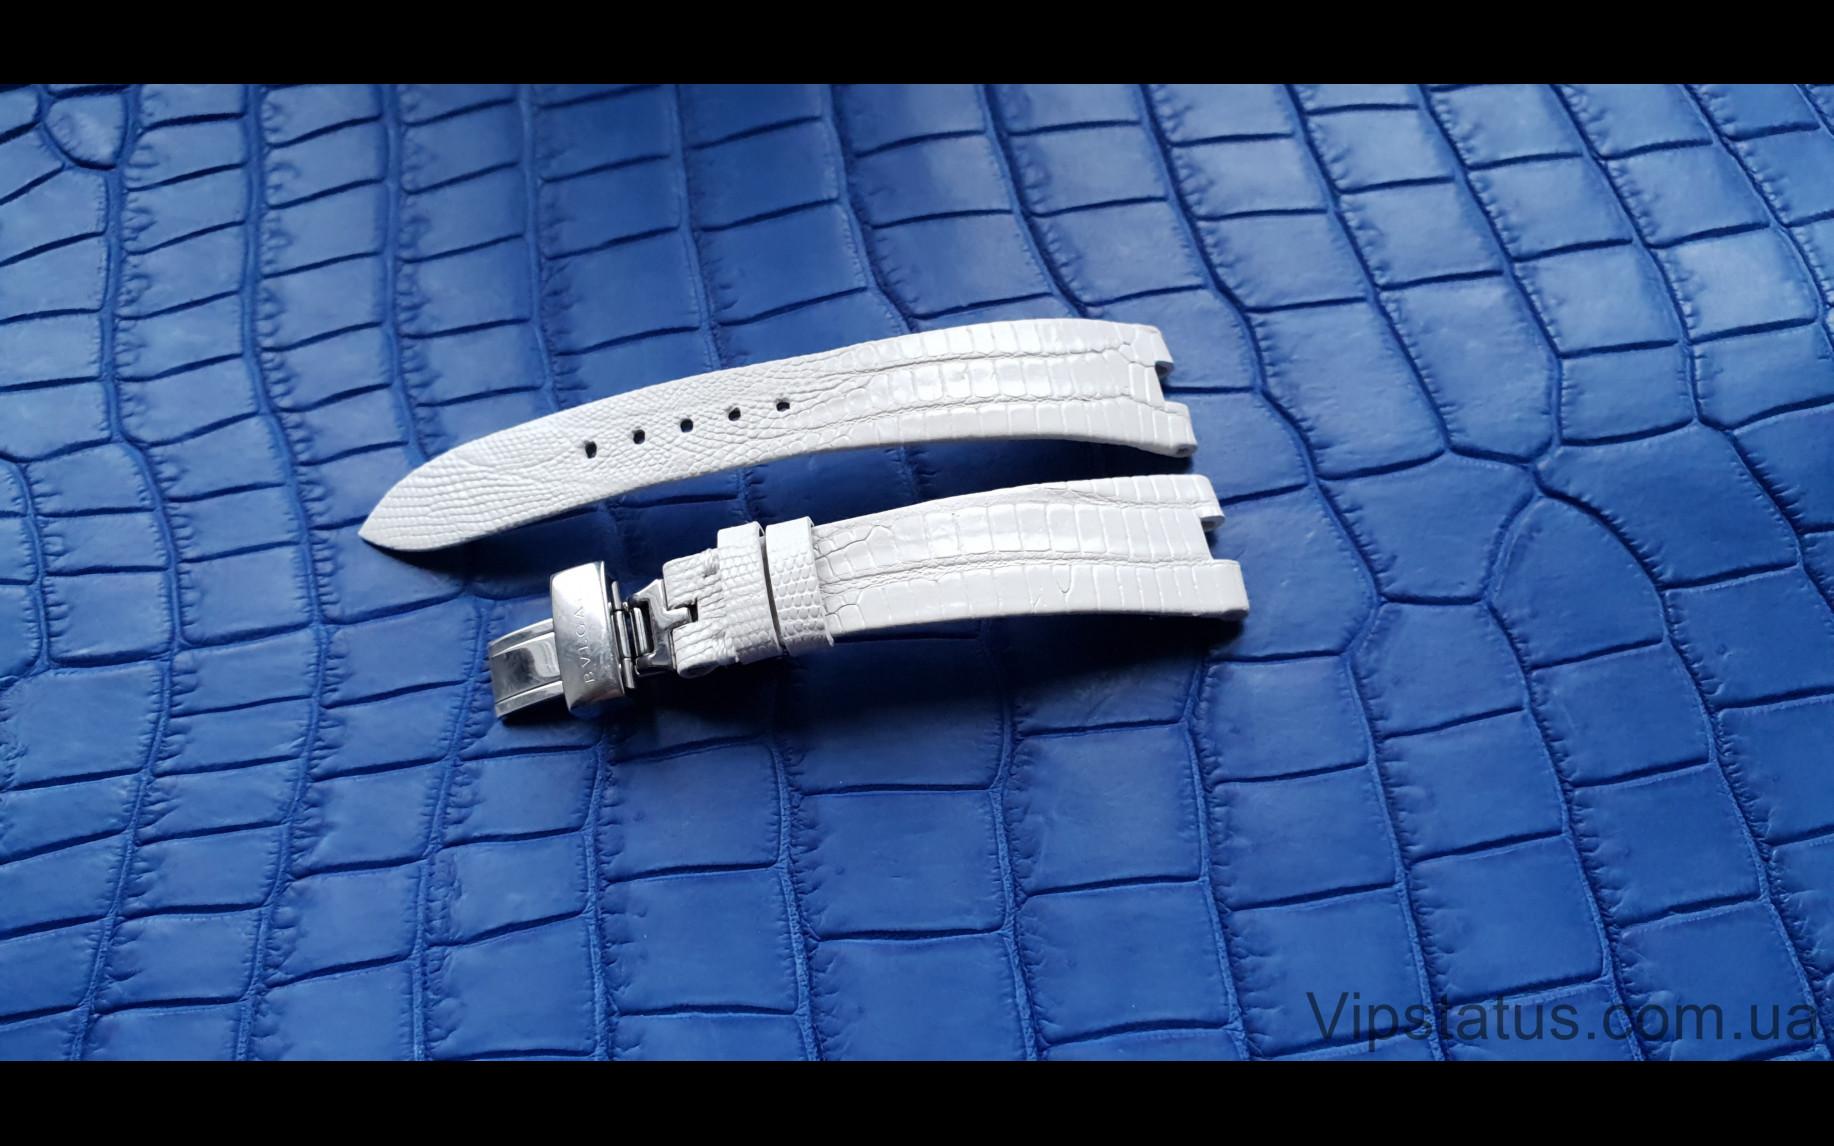 Elite Вип ремешок для часов Bvlgari кожа крокодила Vip Crocodile Strap for Bvlgari watches image 1